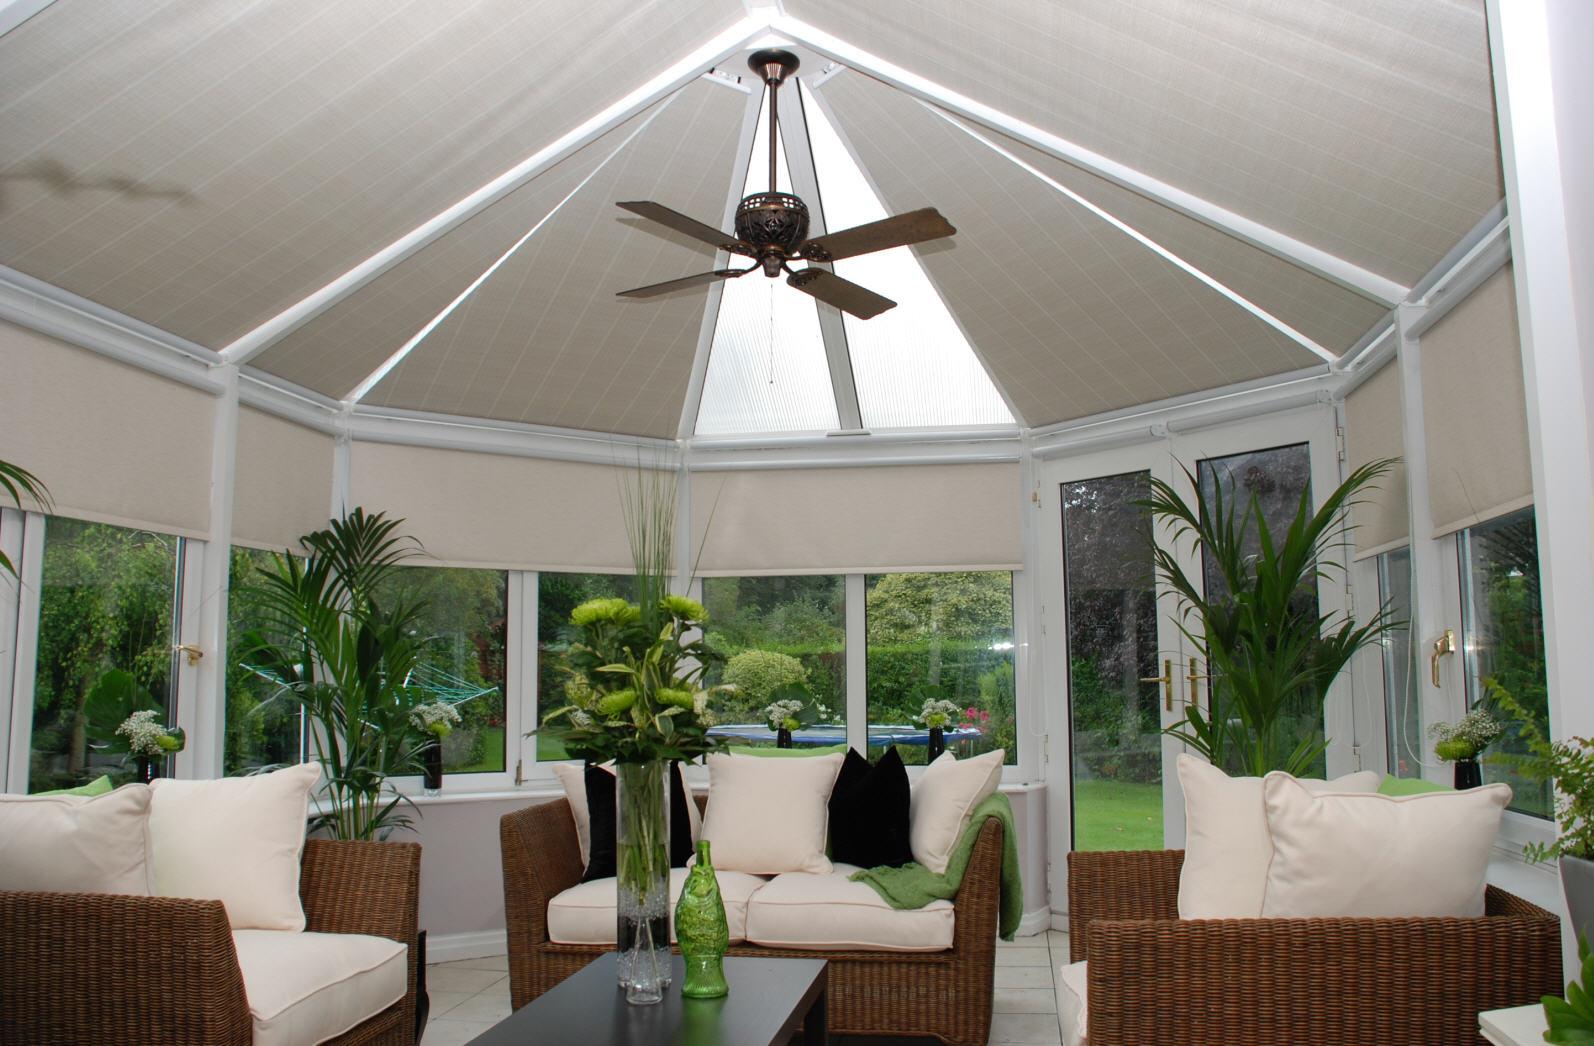 Modern conservatory design ideas - Hunter Ceiling Fan